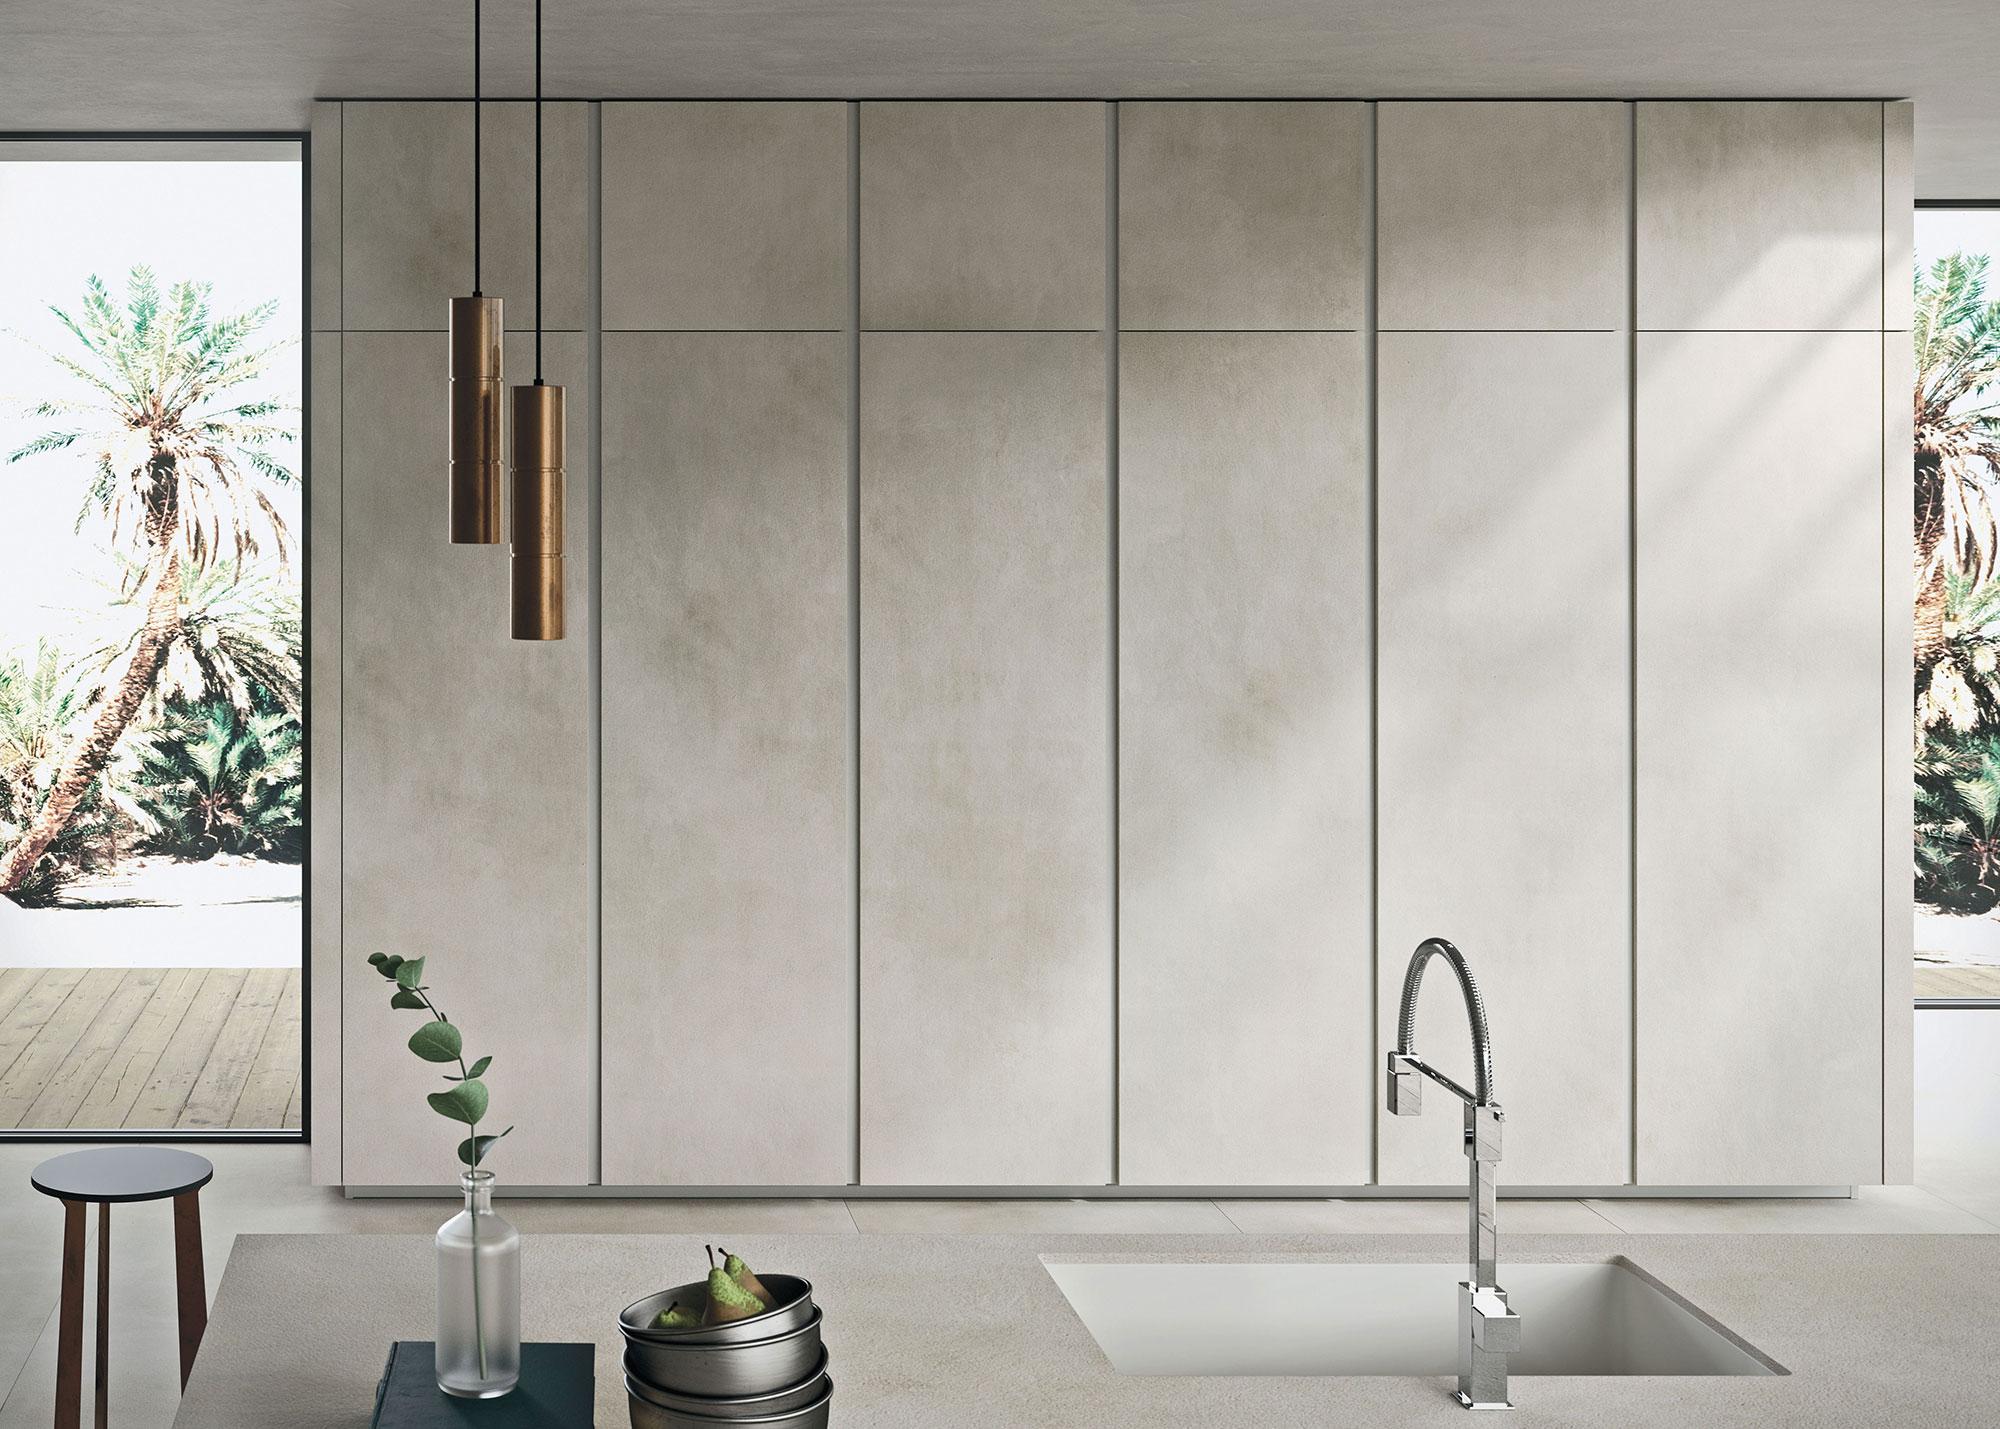 Italiaanse designkeuken Snaidero Way Materia. Moderne greeploze keuken in lichte kleur 'calce' kalk grijs #design #designkeuken #snaidero #madeinitaly #keuken